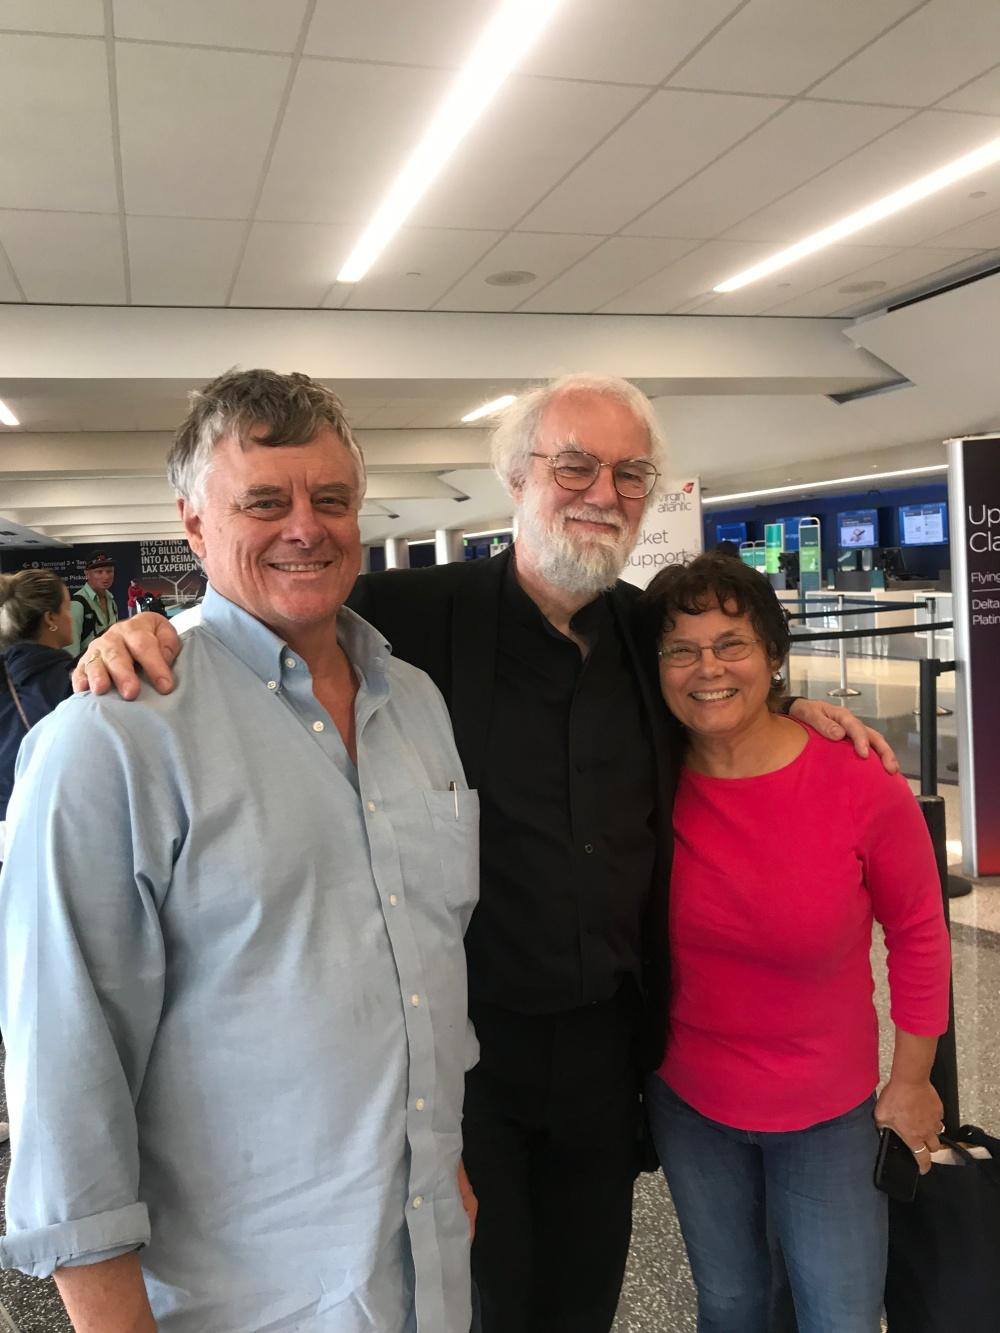 Ray, Rowan and Len